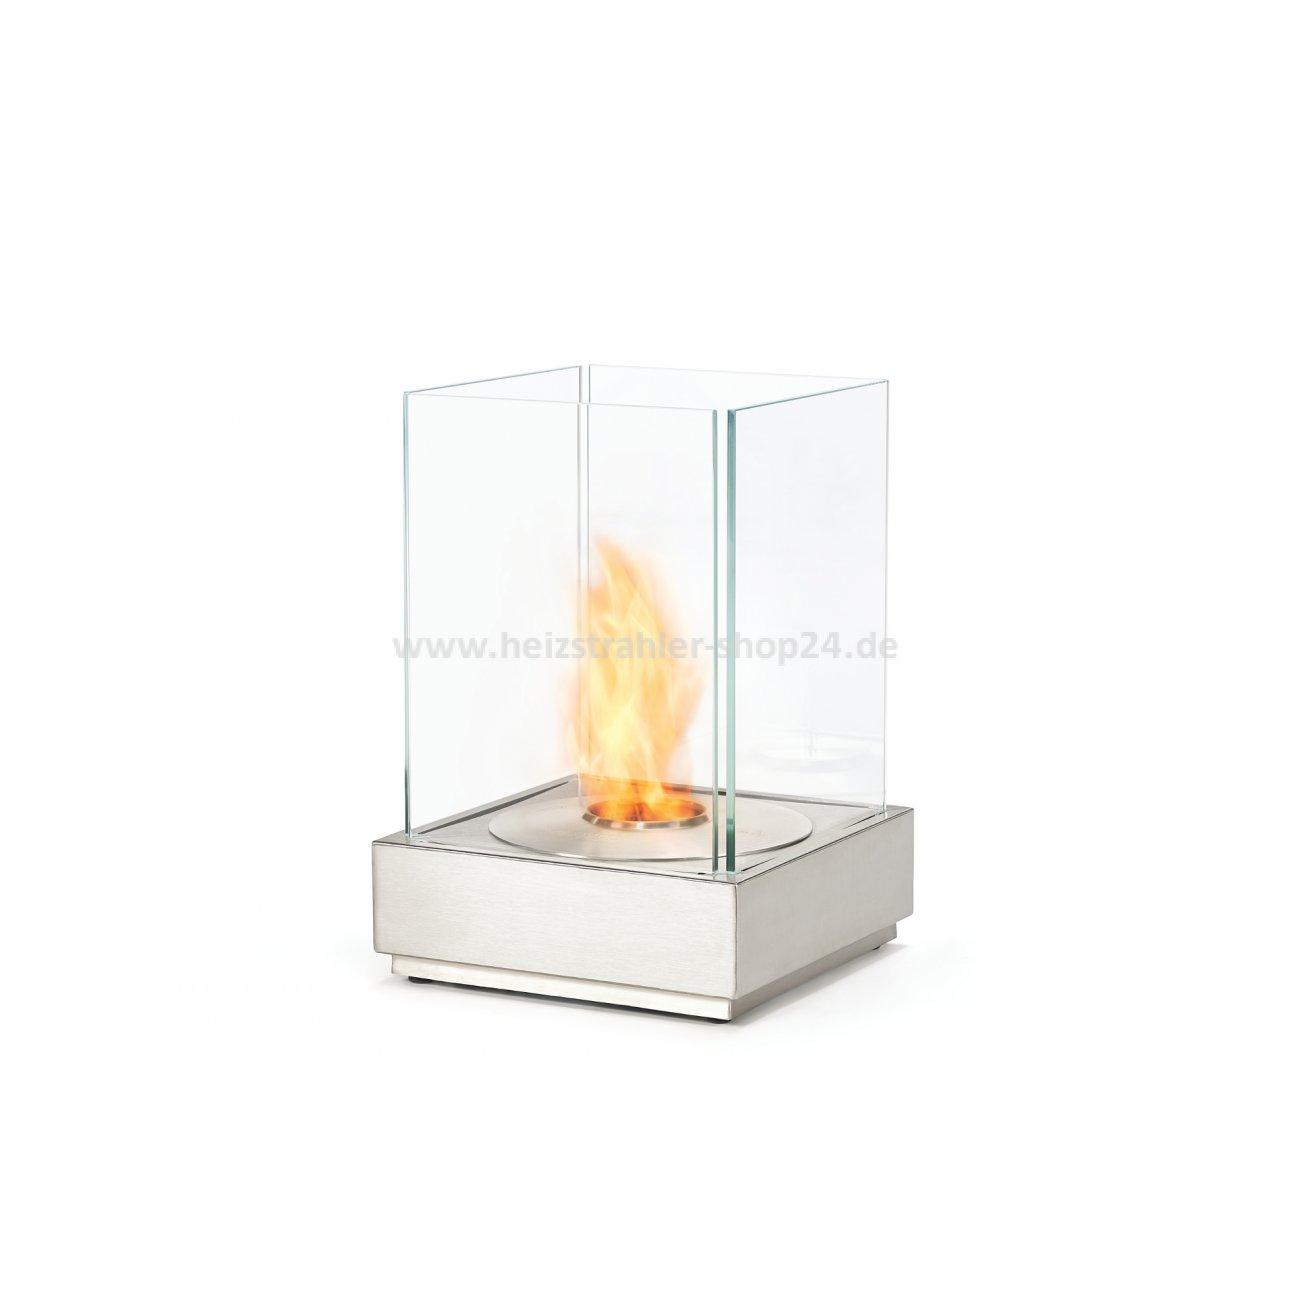 mini t outdoor ethanolkamin von ecosmart. Black Bedroom Furniture Sets. Home Design Ideas